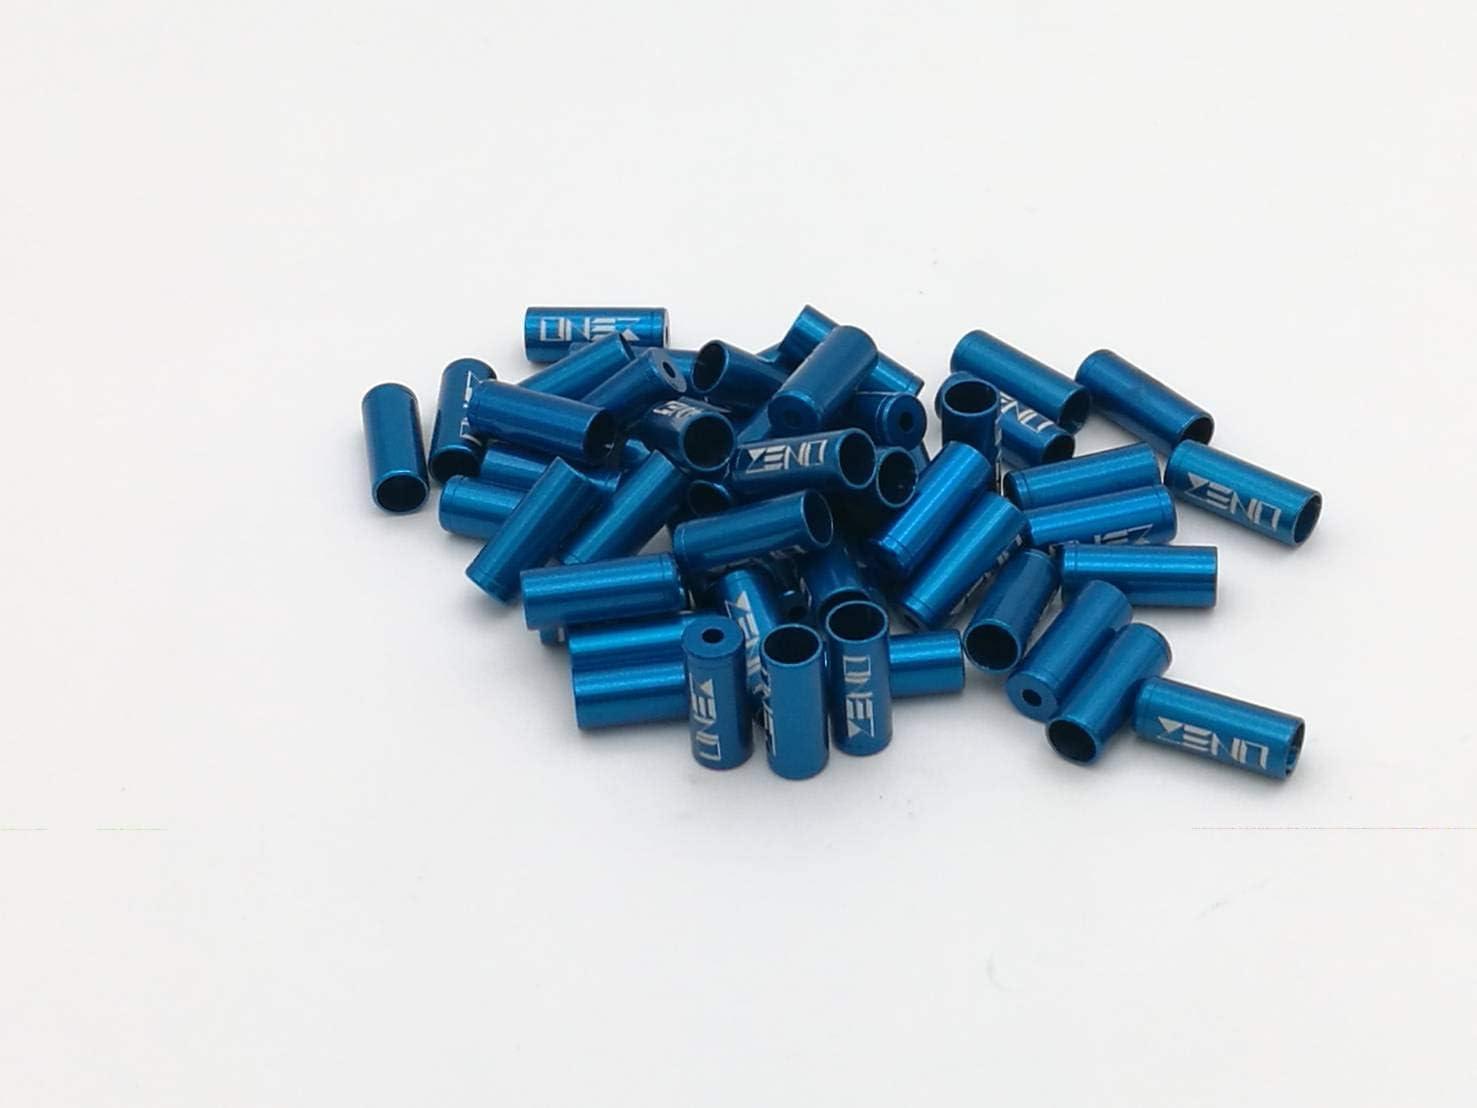 Zeno 5mm Aluminum AL6061 Alloy Bike Brake Cable Housing End Caps Ferrules,50pcs//Bag